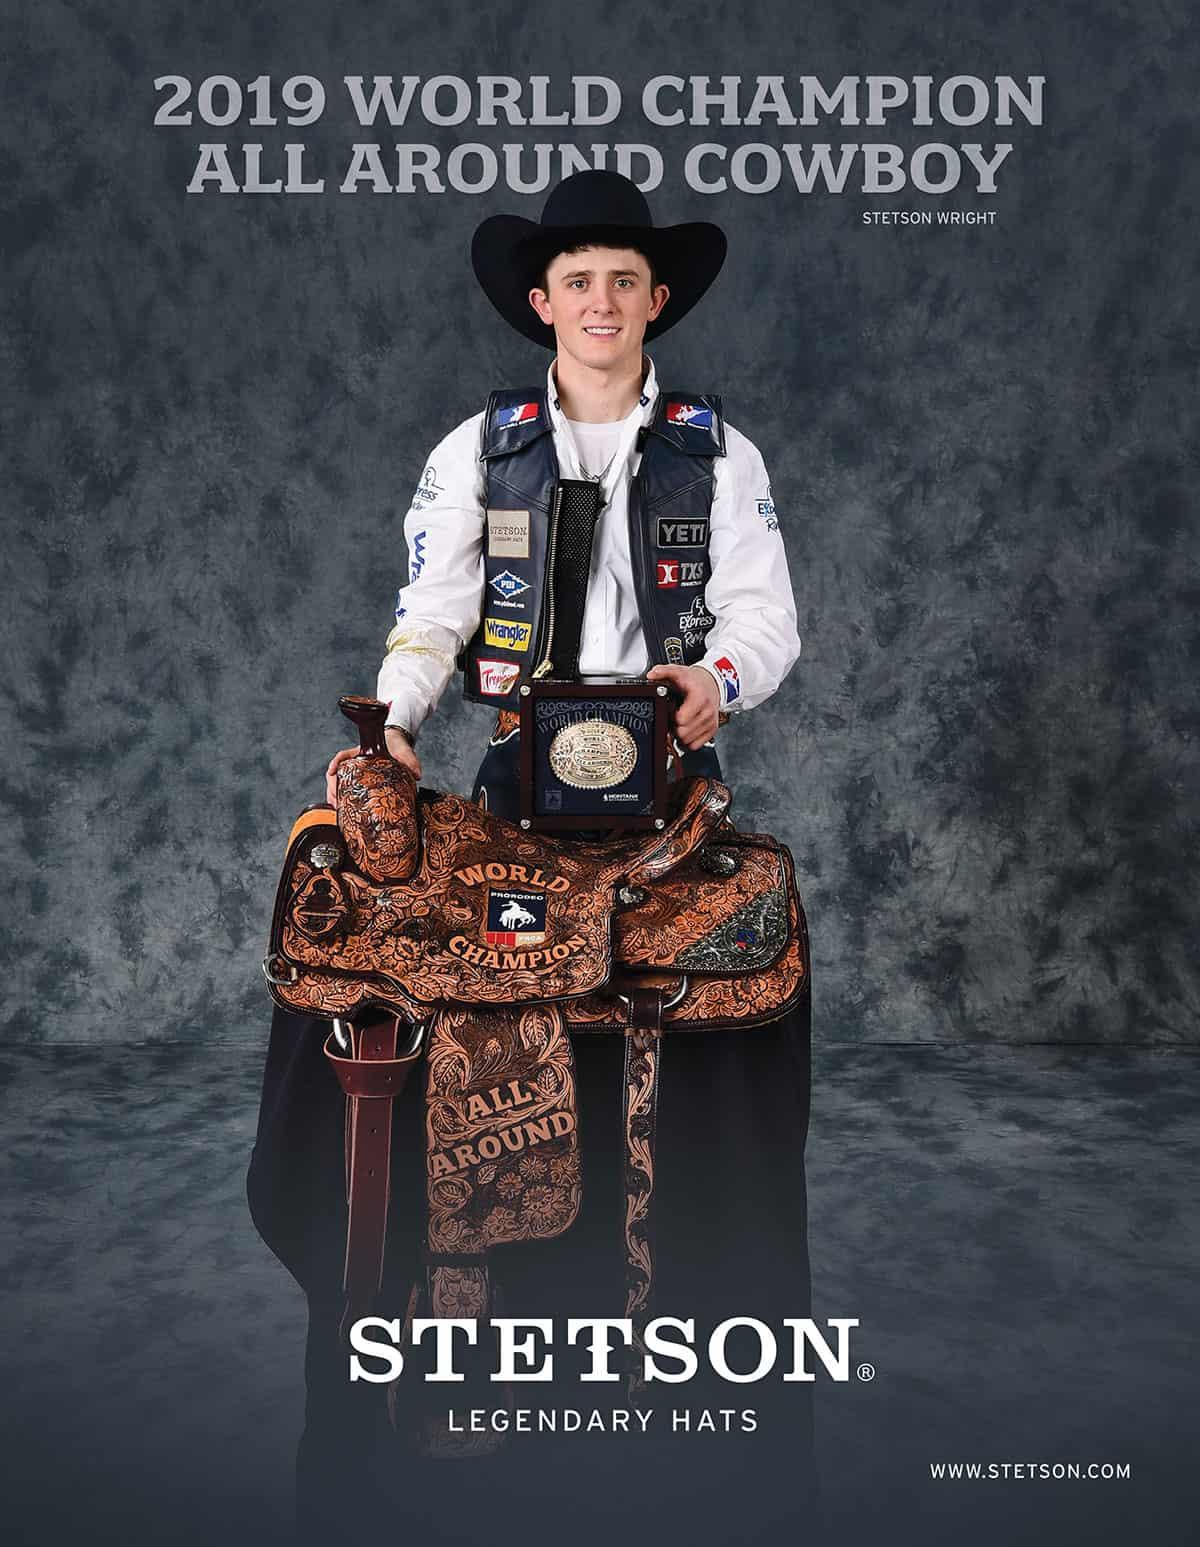 Stetson Wright